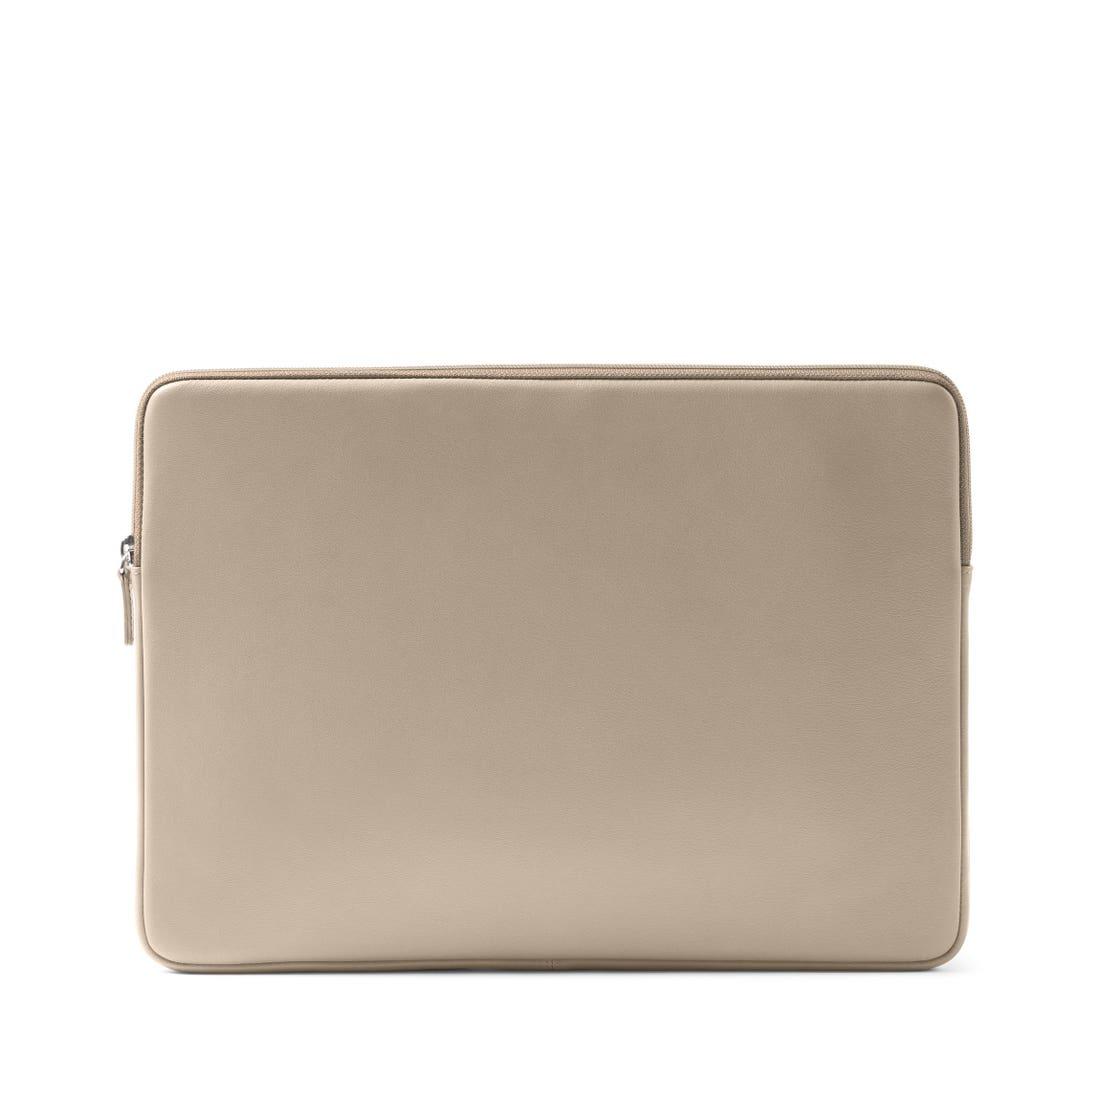 15 Inch Slim Laptop Sleeve